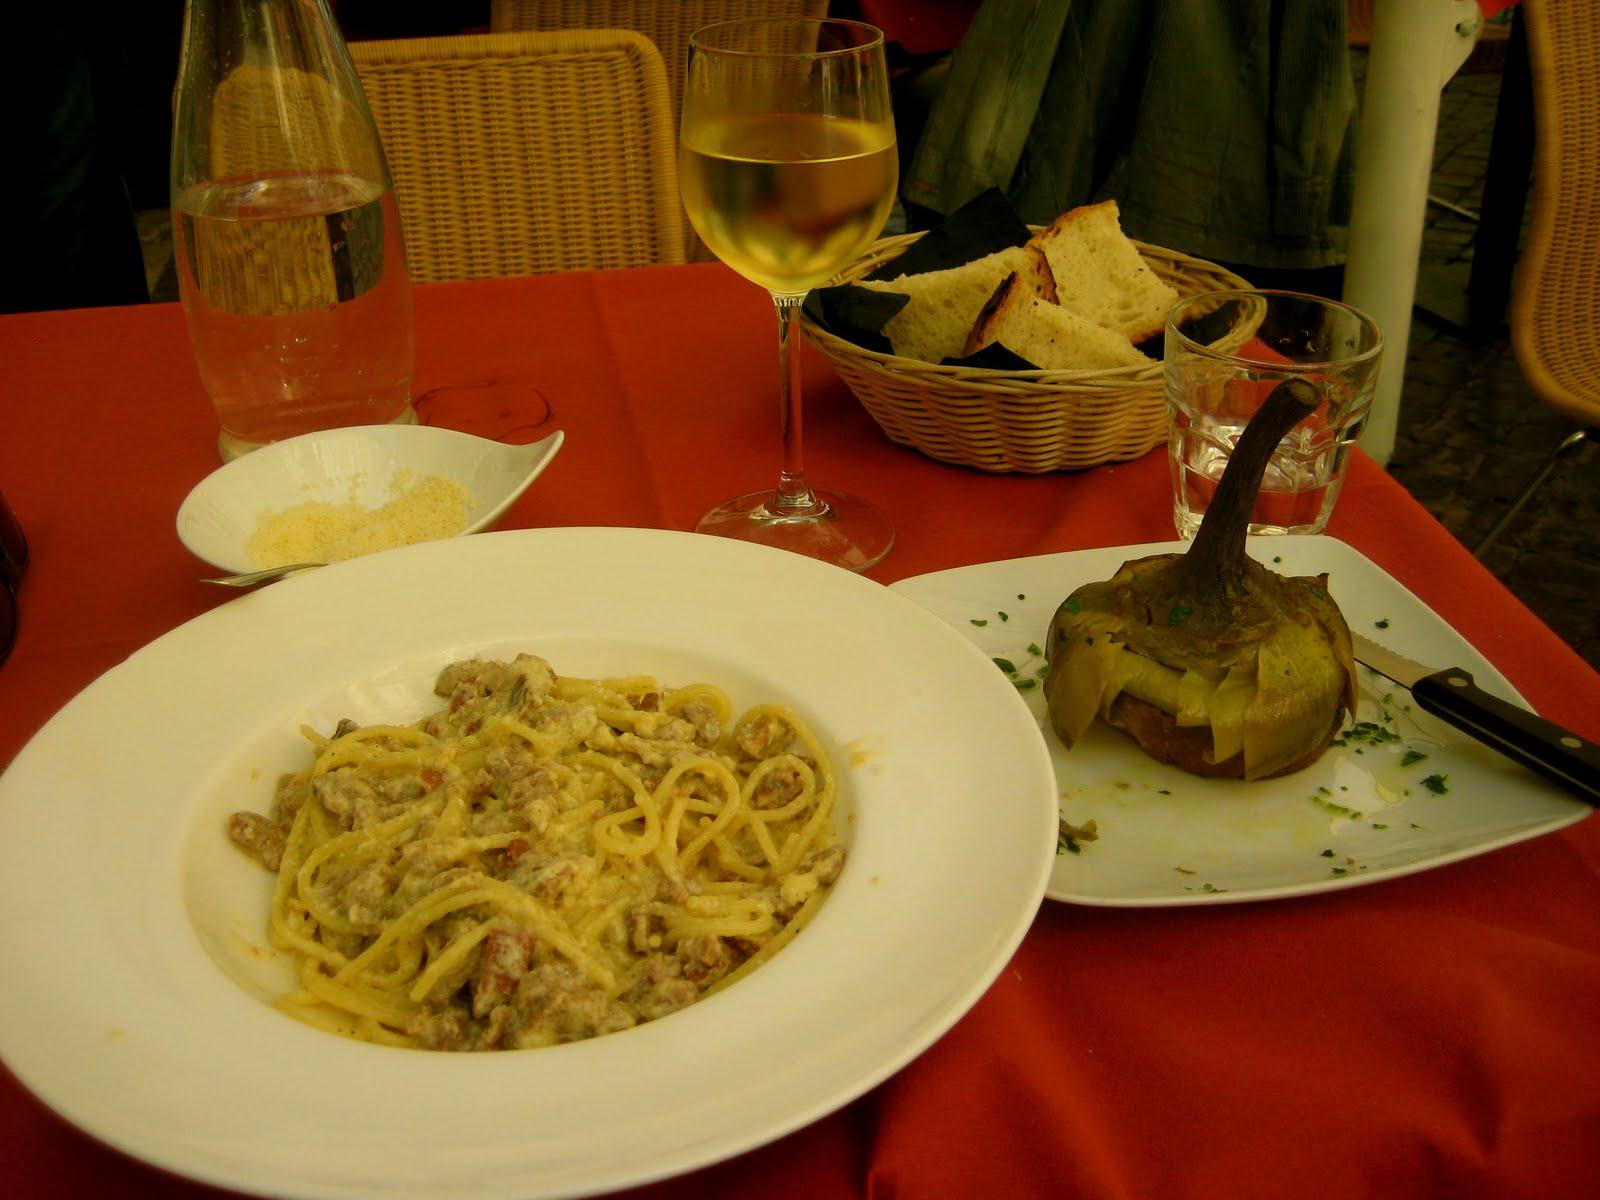 roman style spaghetti alla carbonara spaghetti carbonara roman style ...